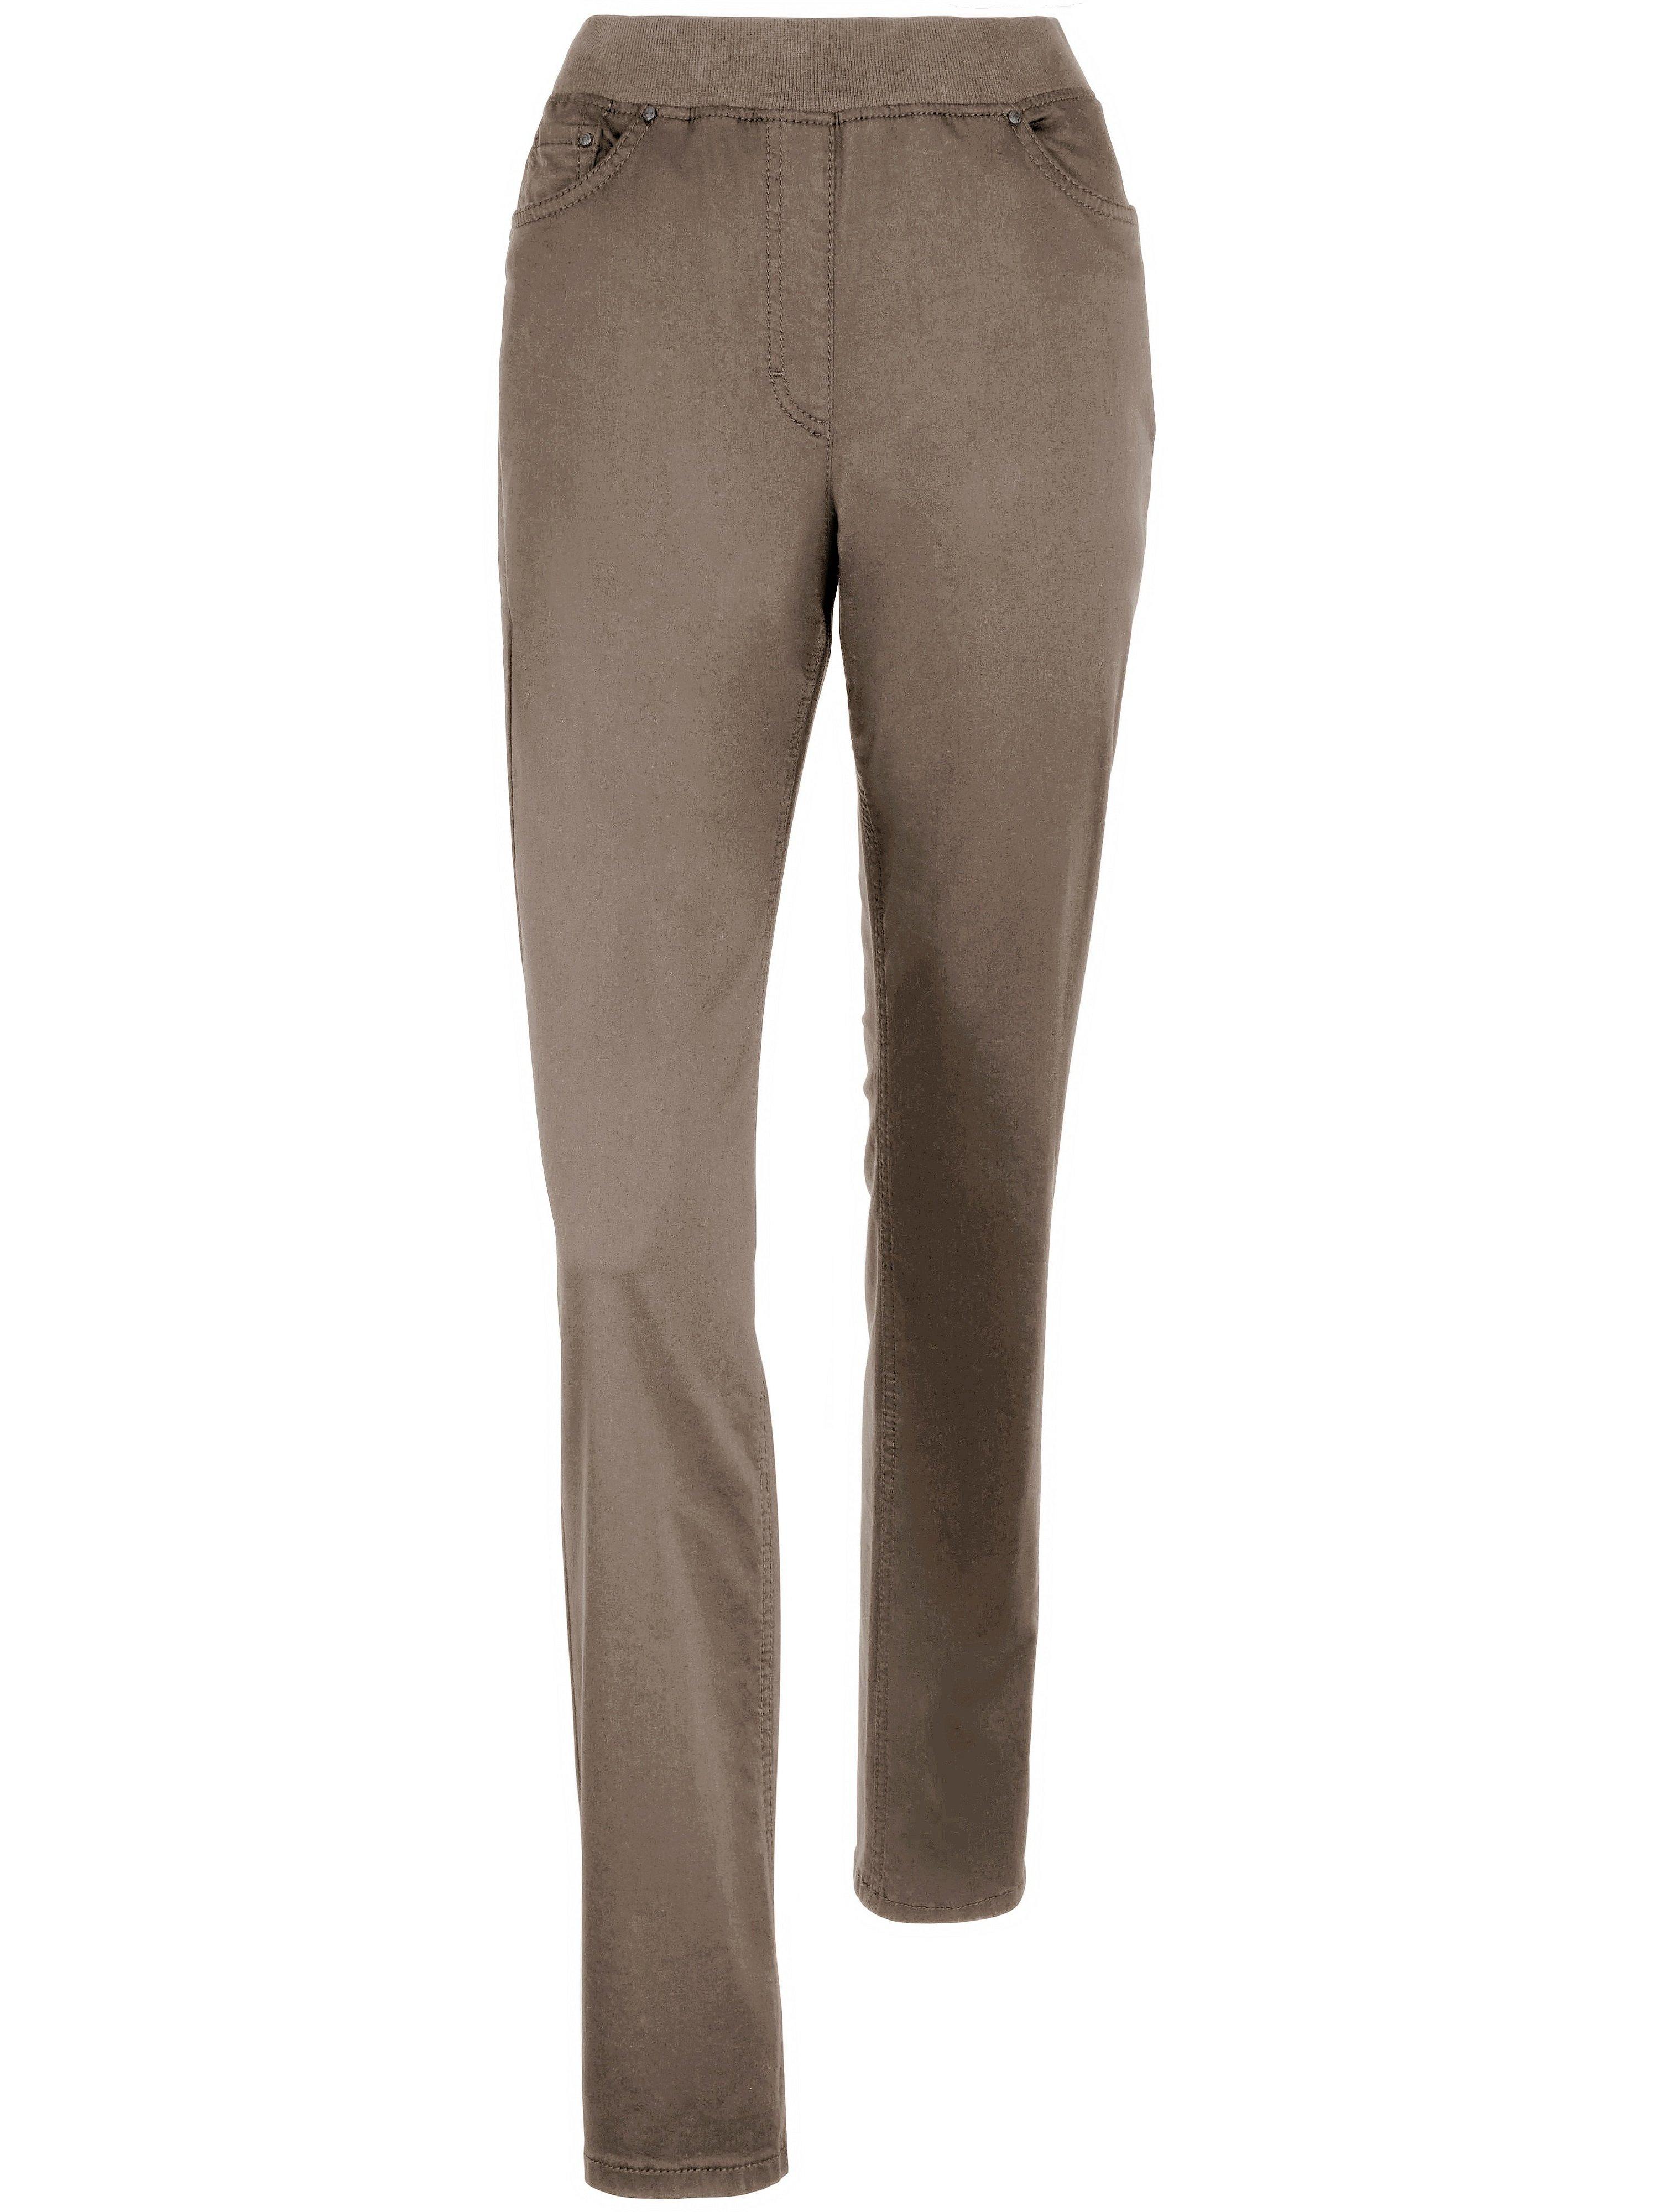 ProForm Slim slip-on trousers design Pamina Raphaela by Brax beige